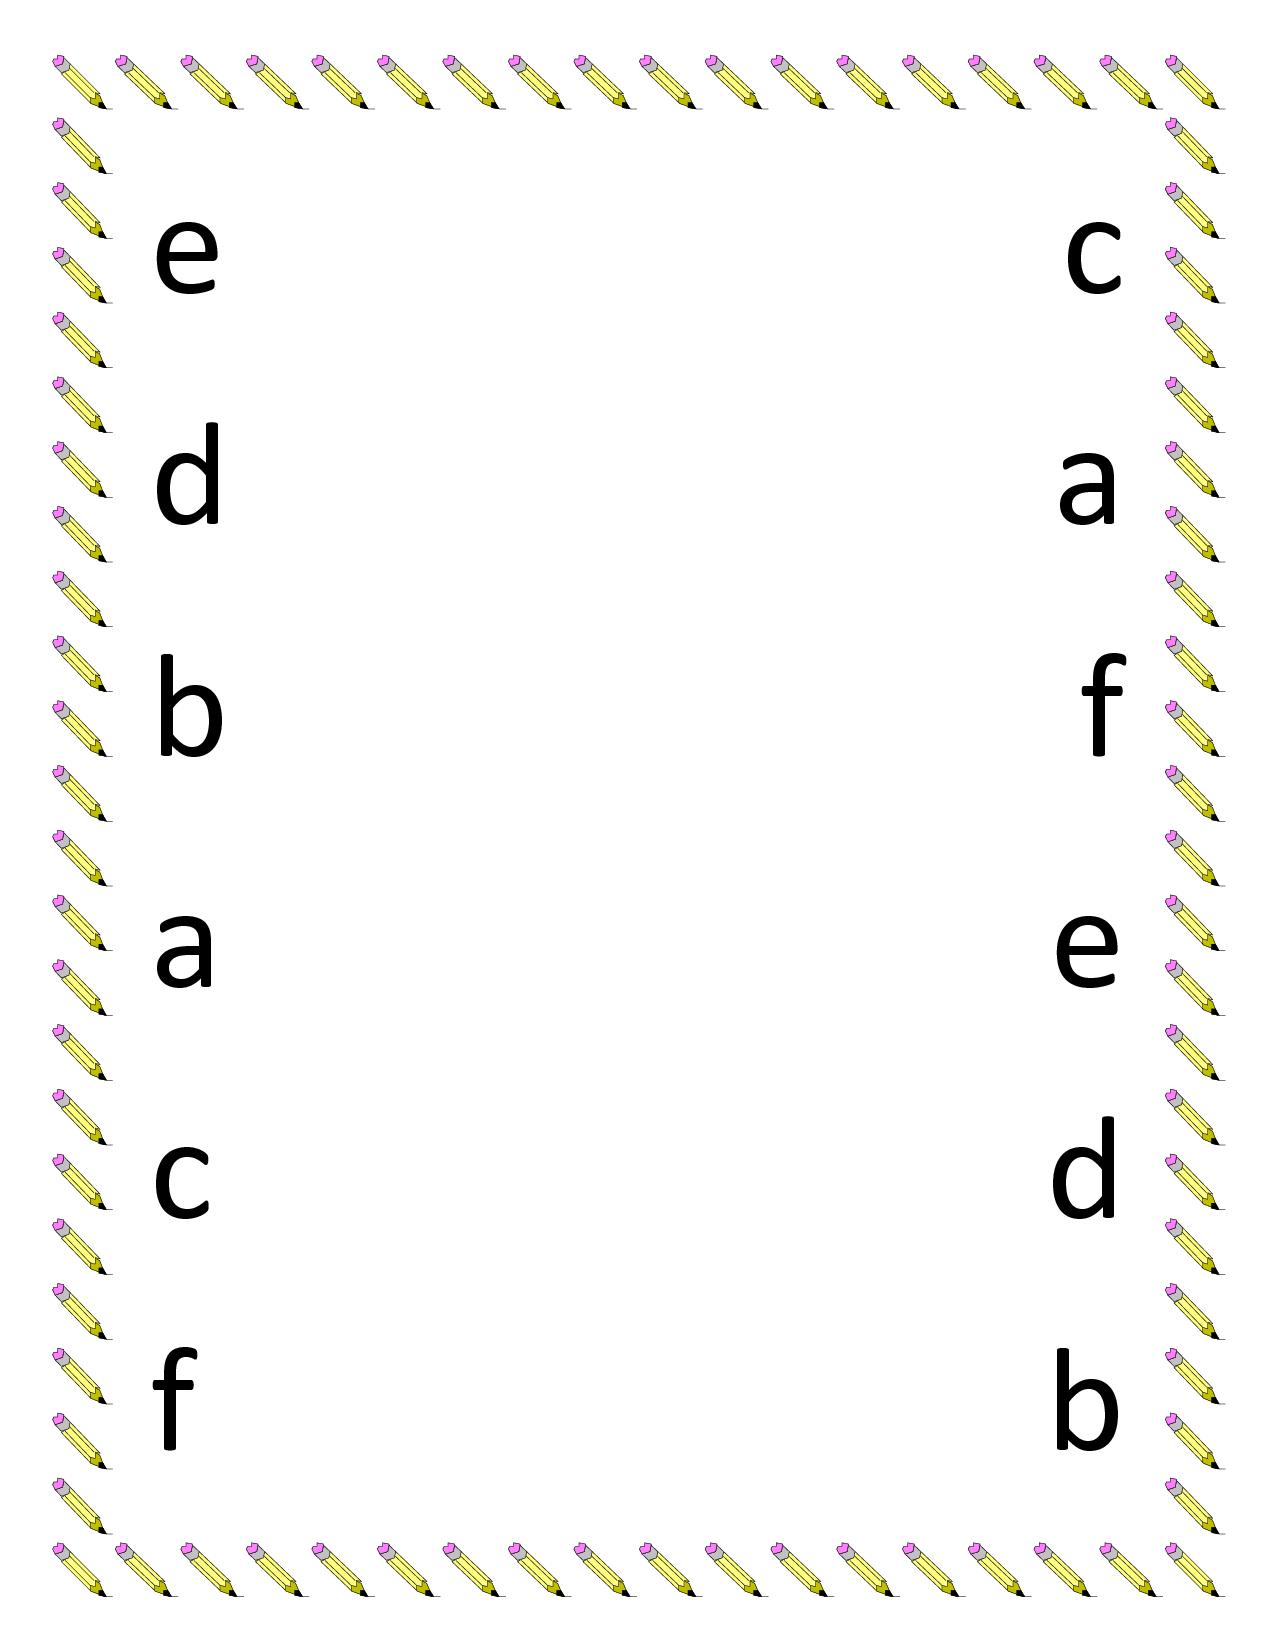 Google Image Result In 2020   Abc Worksheets, Kindergarten pertaining to Alphabet Matching Worksheets For Preschoolers